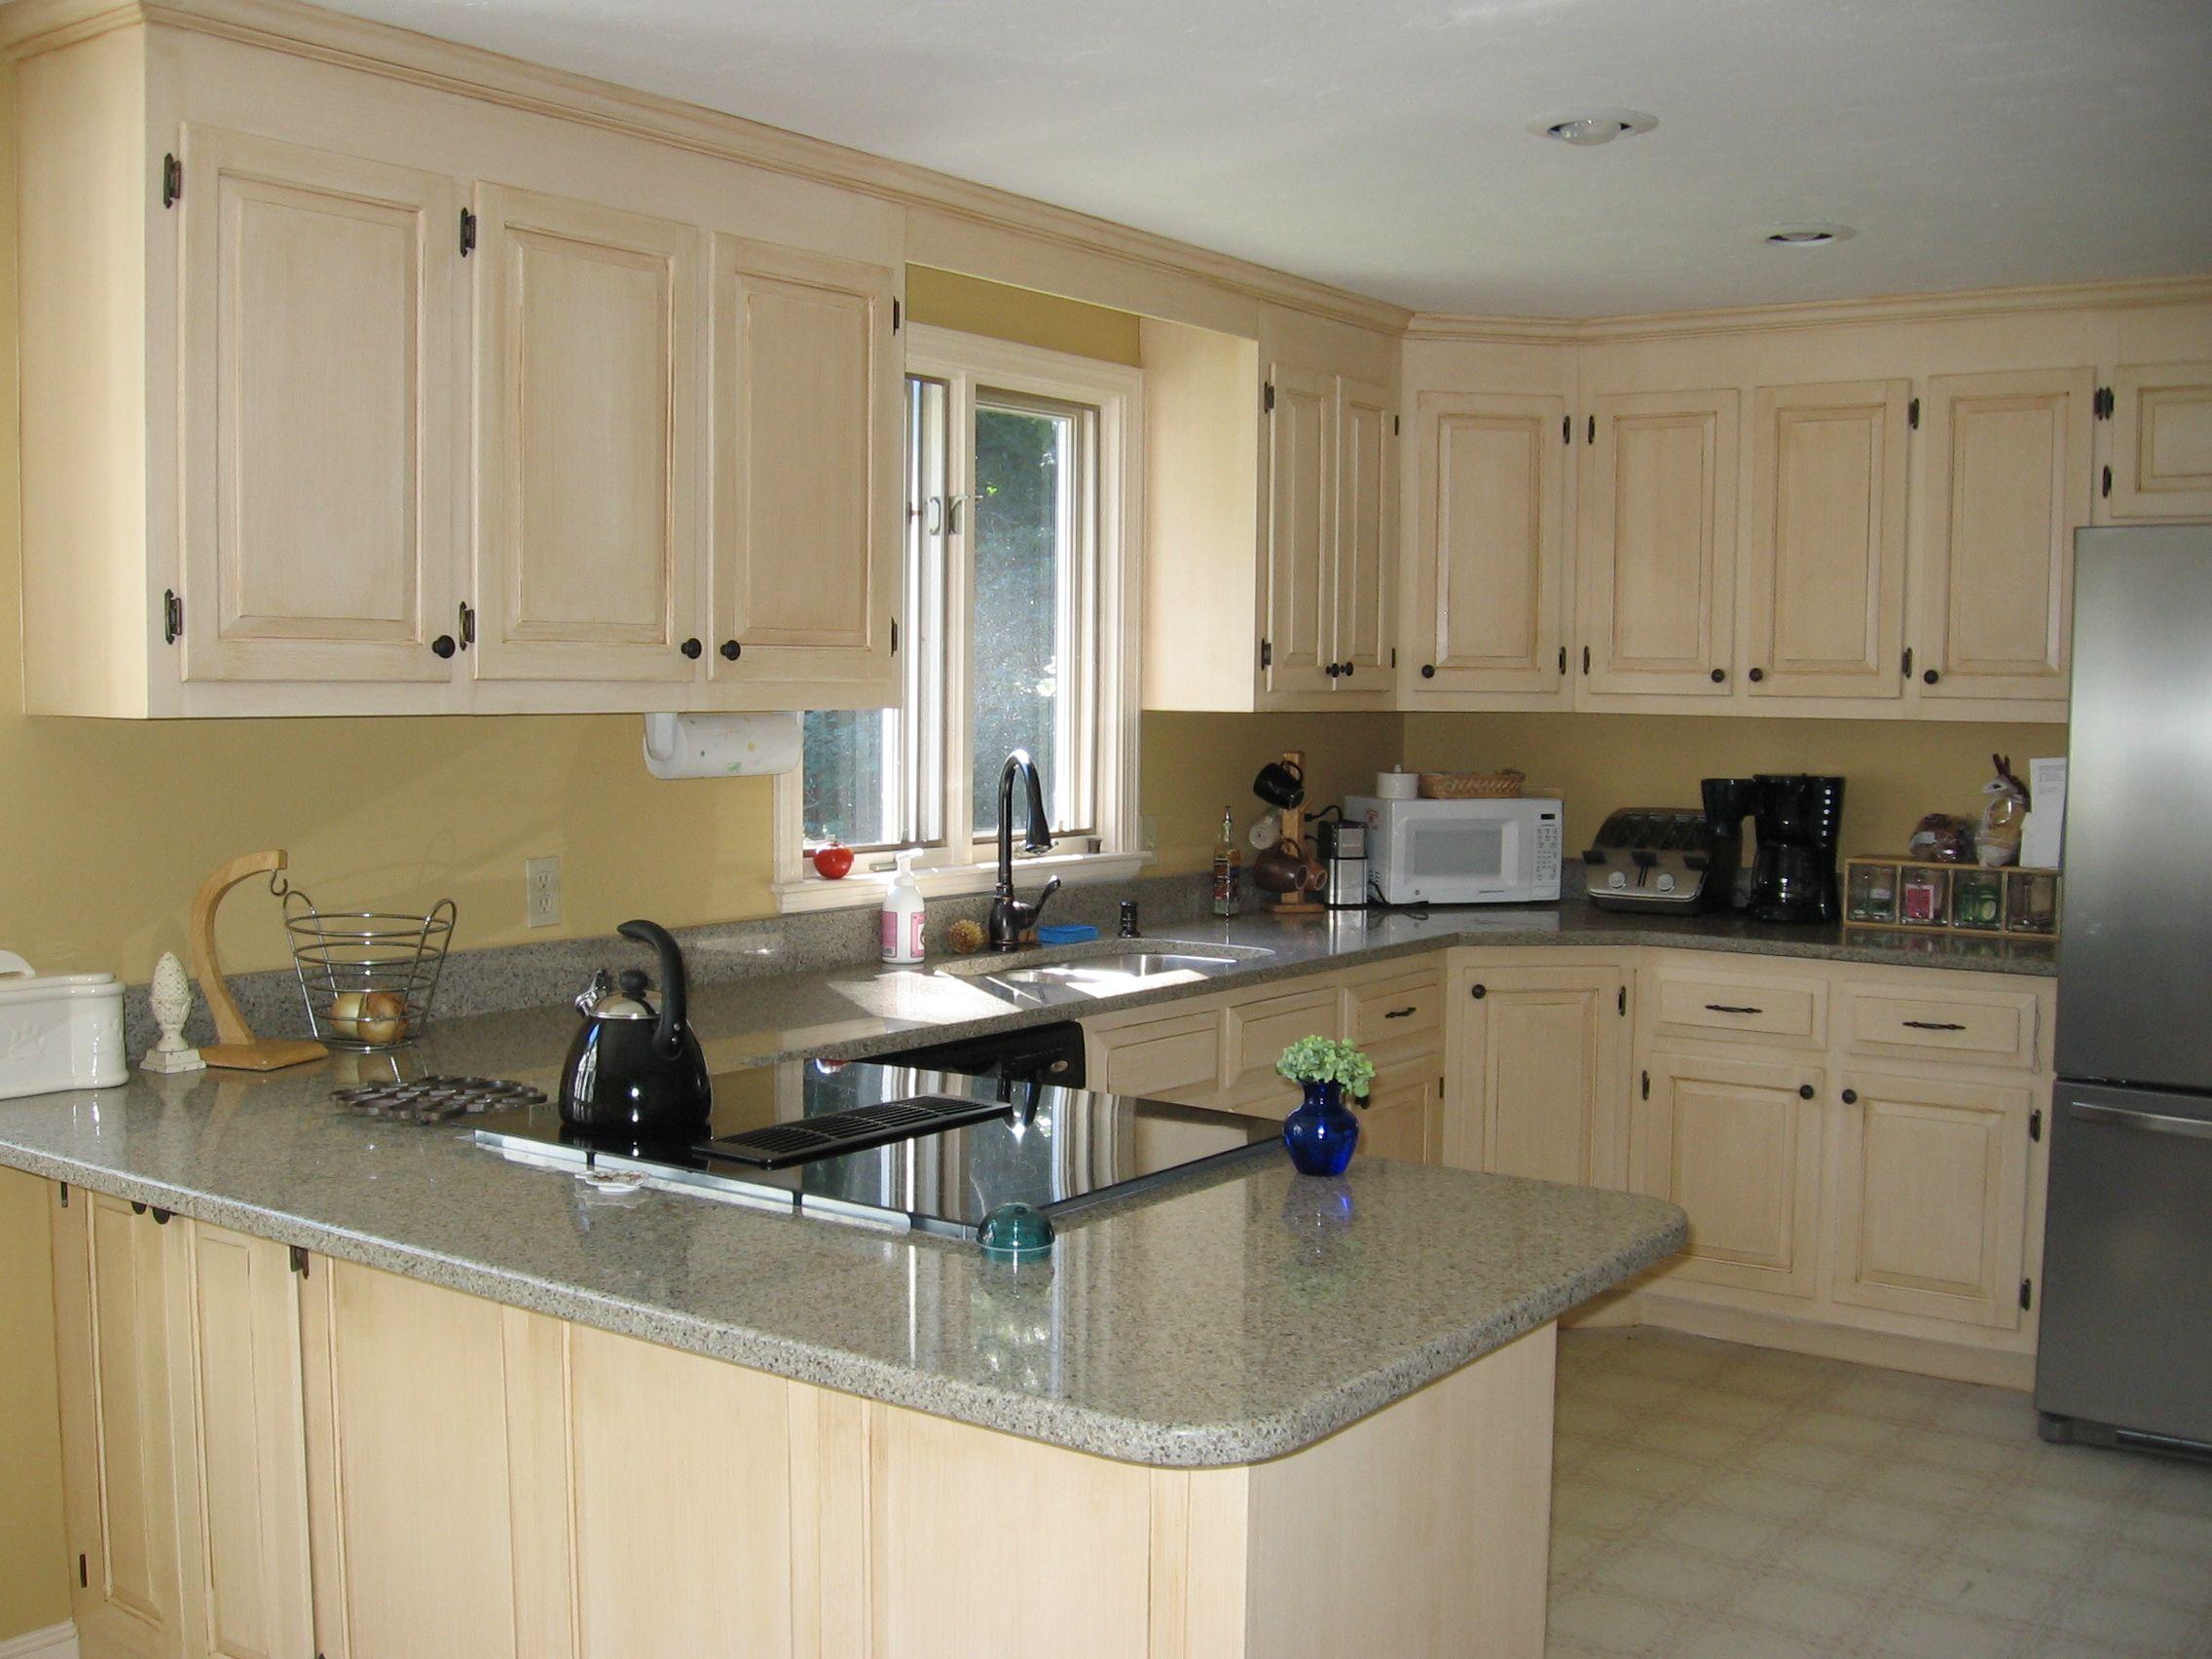 painting wood kitchen cabinets ideas | kitchen cabinet refinishing